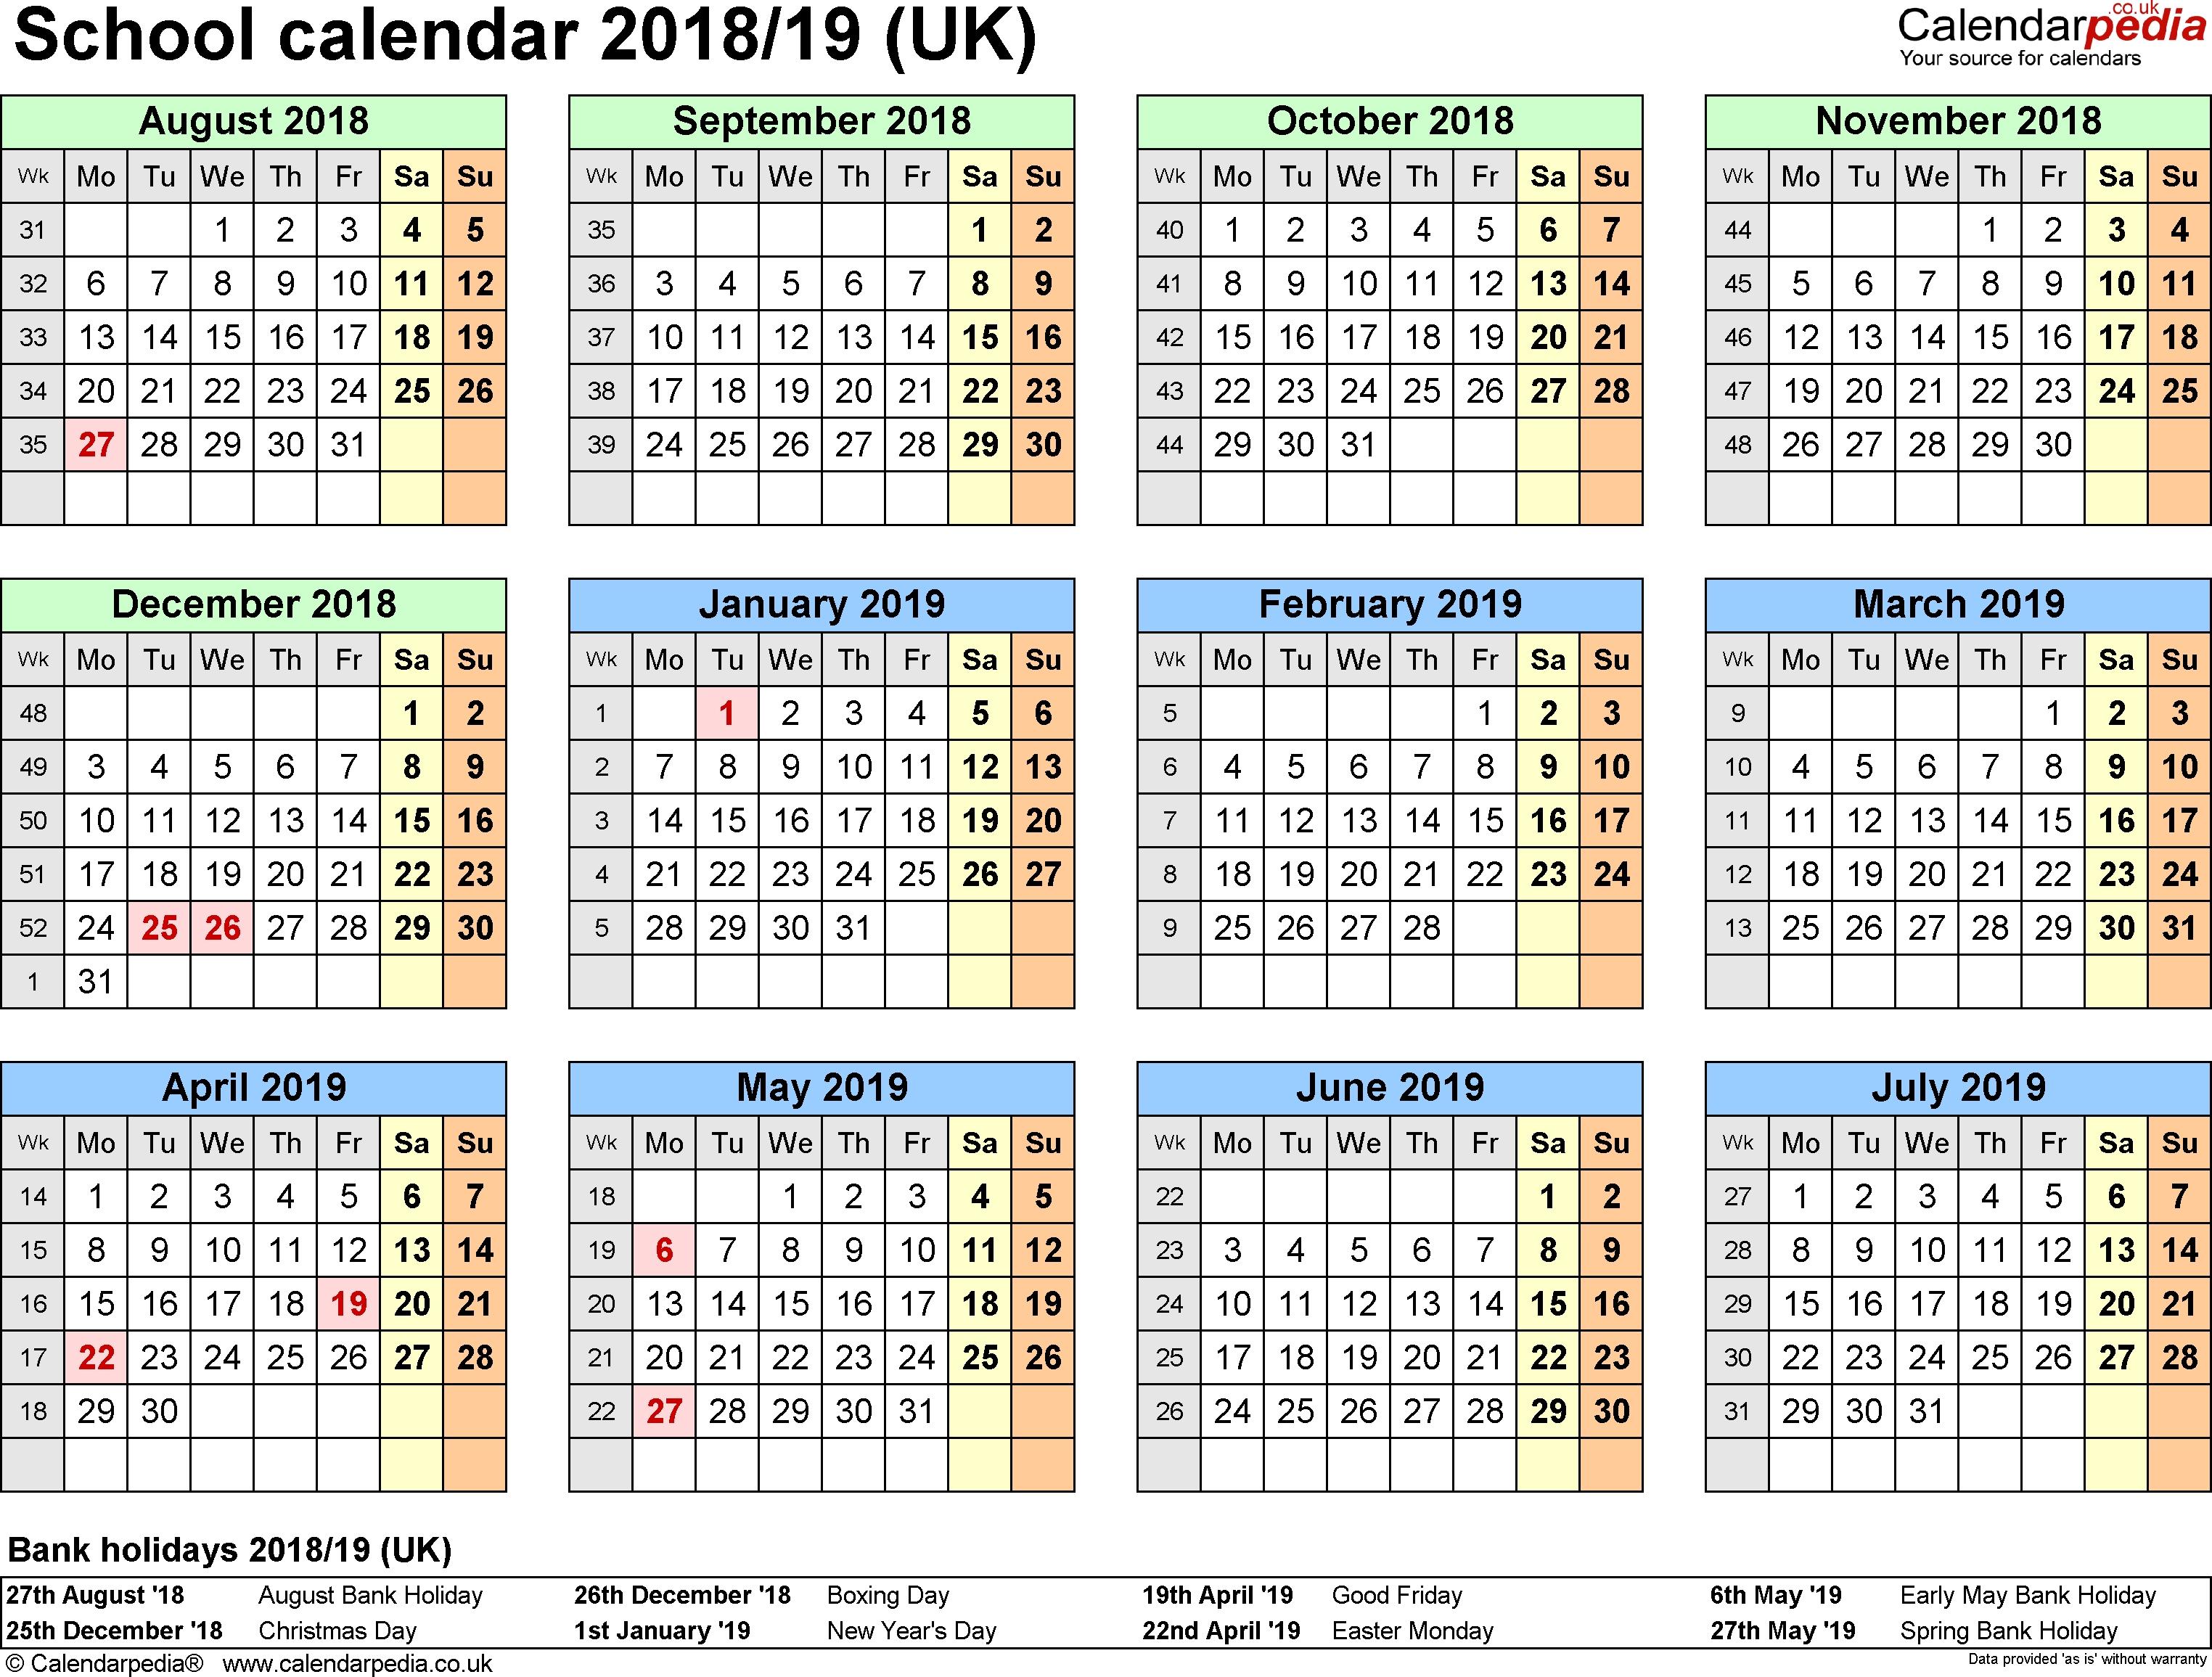 School Calendars 2018/2019 As Free Printable Word Templates Calendar 2019 Ireland